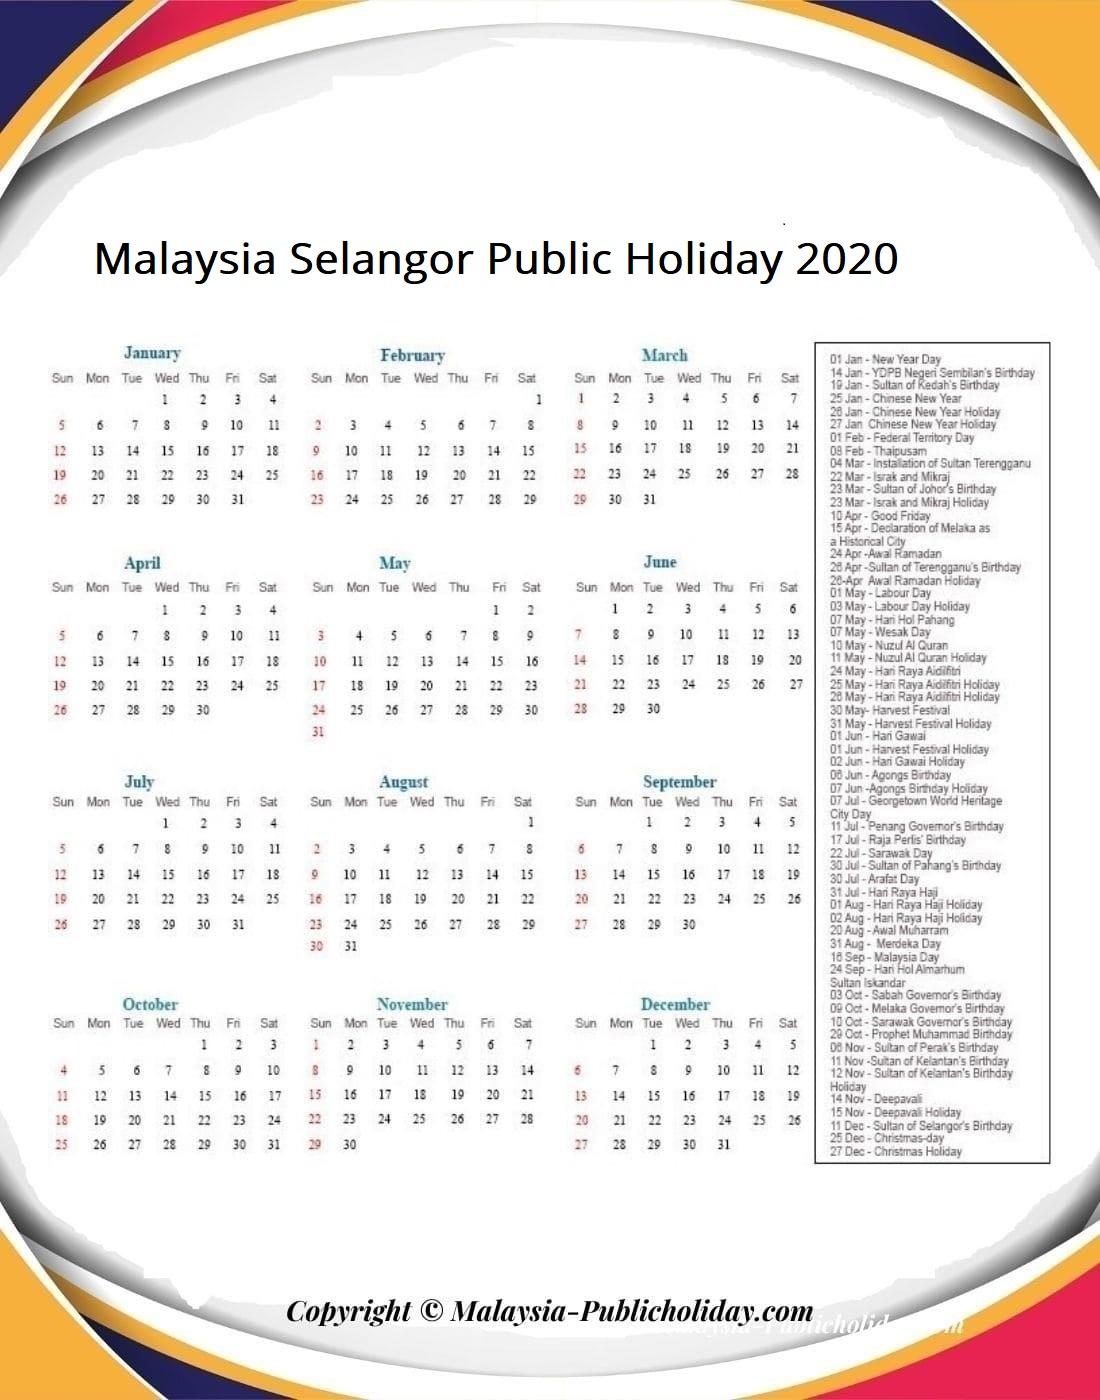 Selangor Calendars 2020 Malaysia